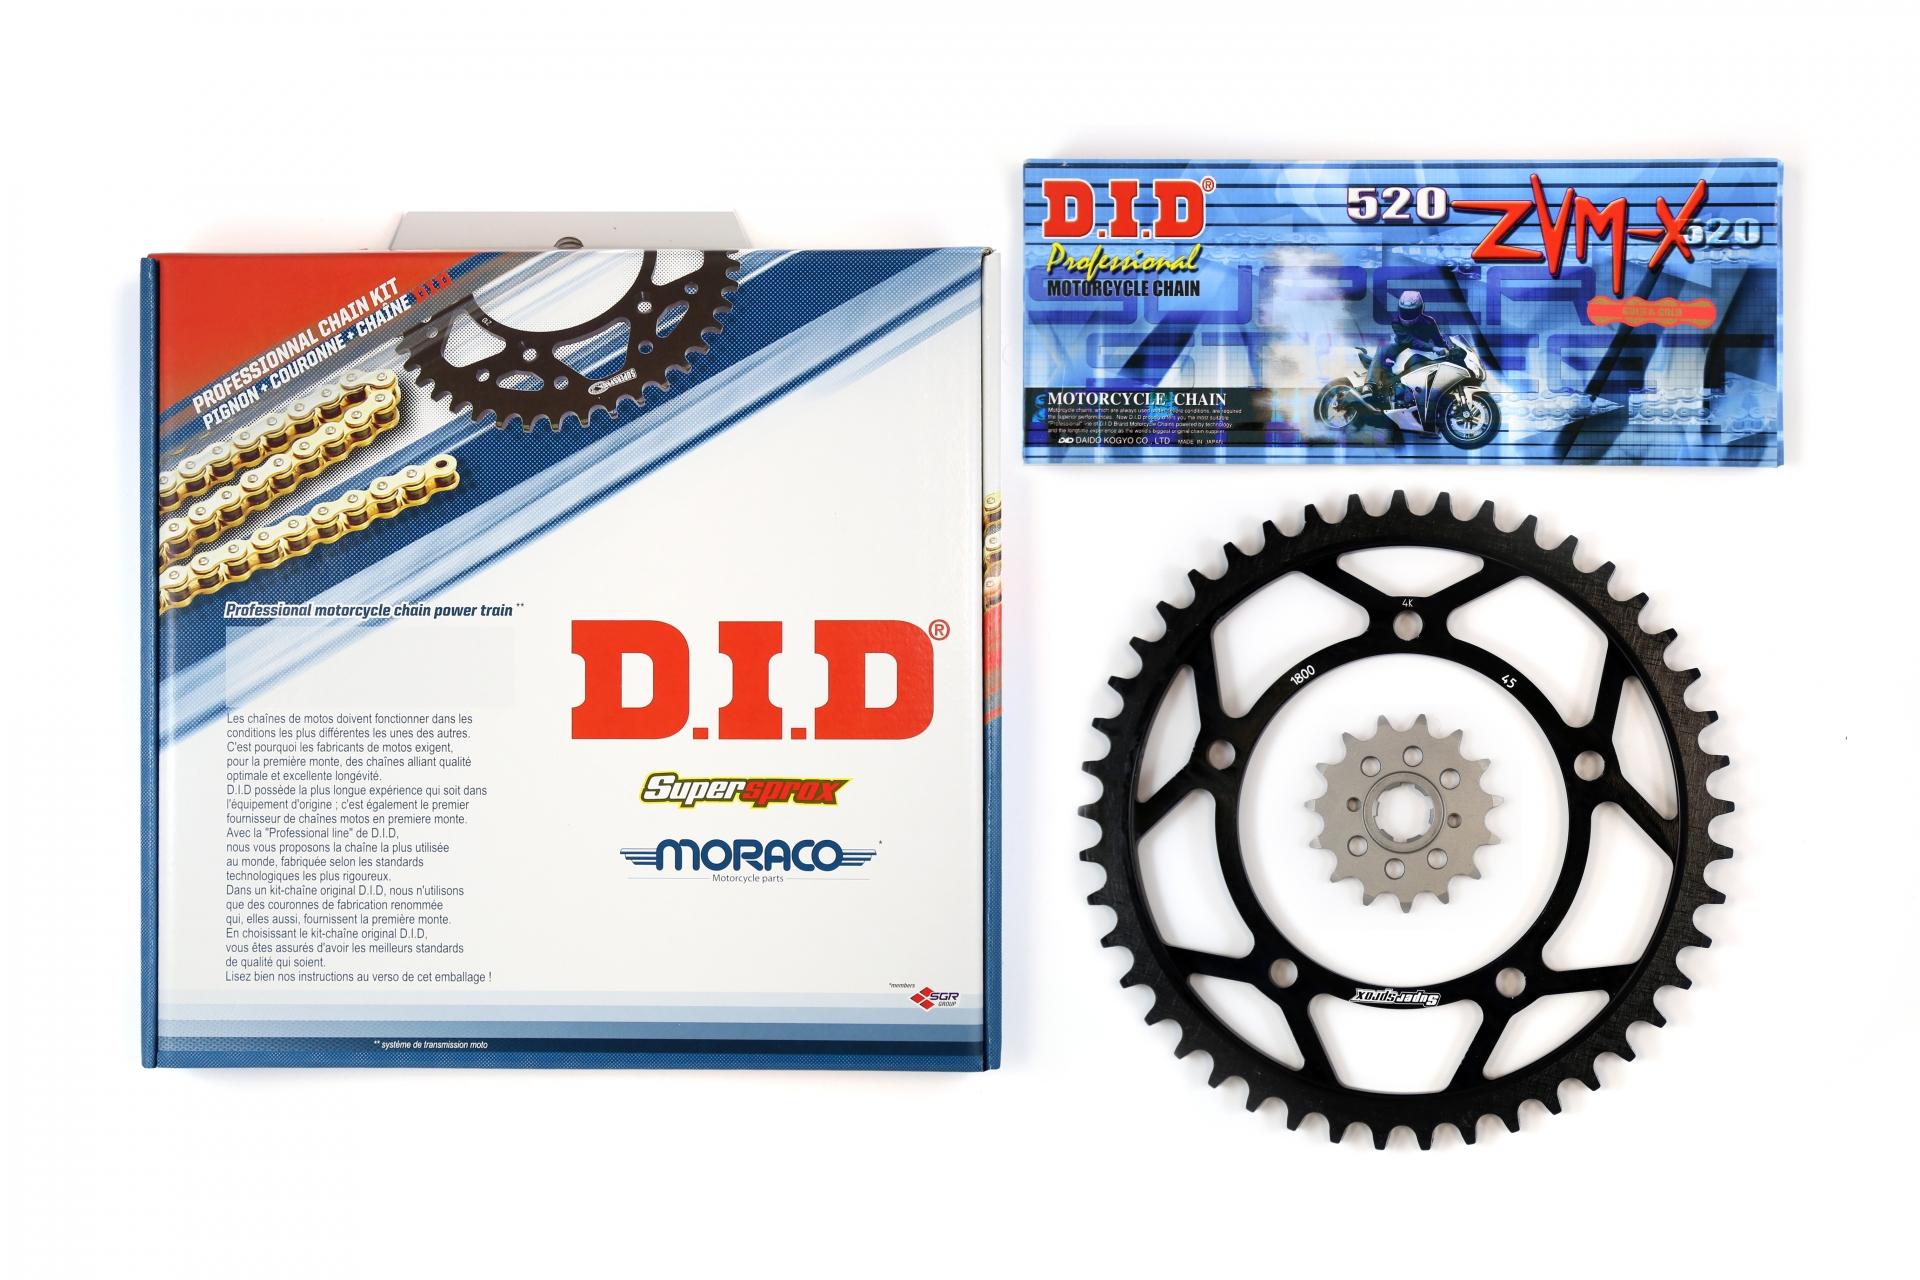 Kit chaîne DID acier Ducati 1000 Monster S ie / S 03-04